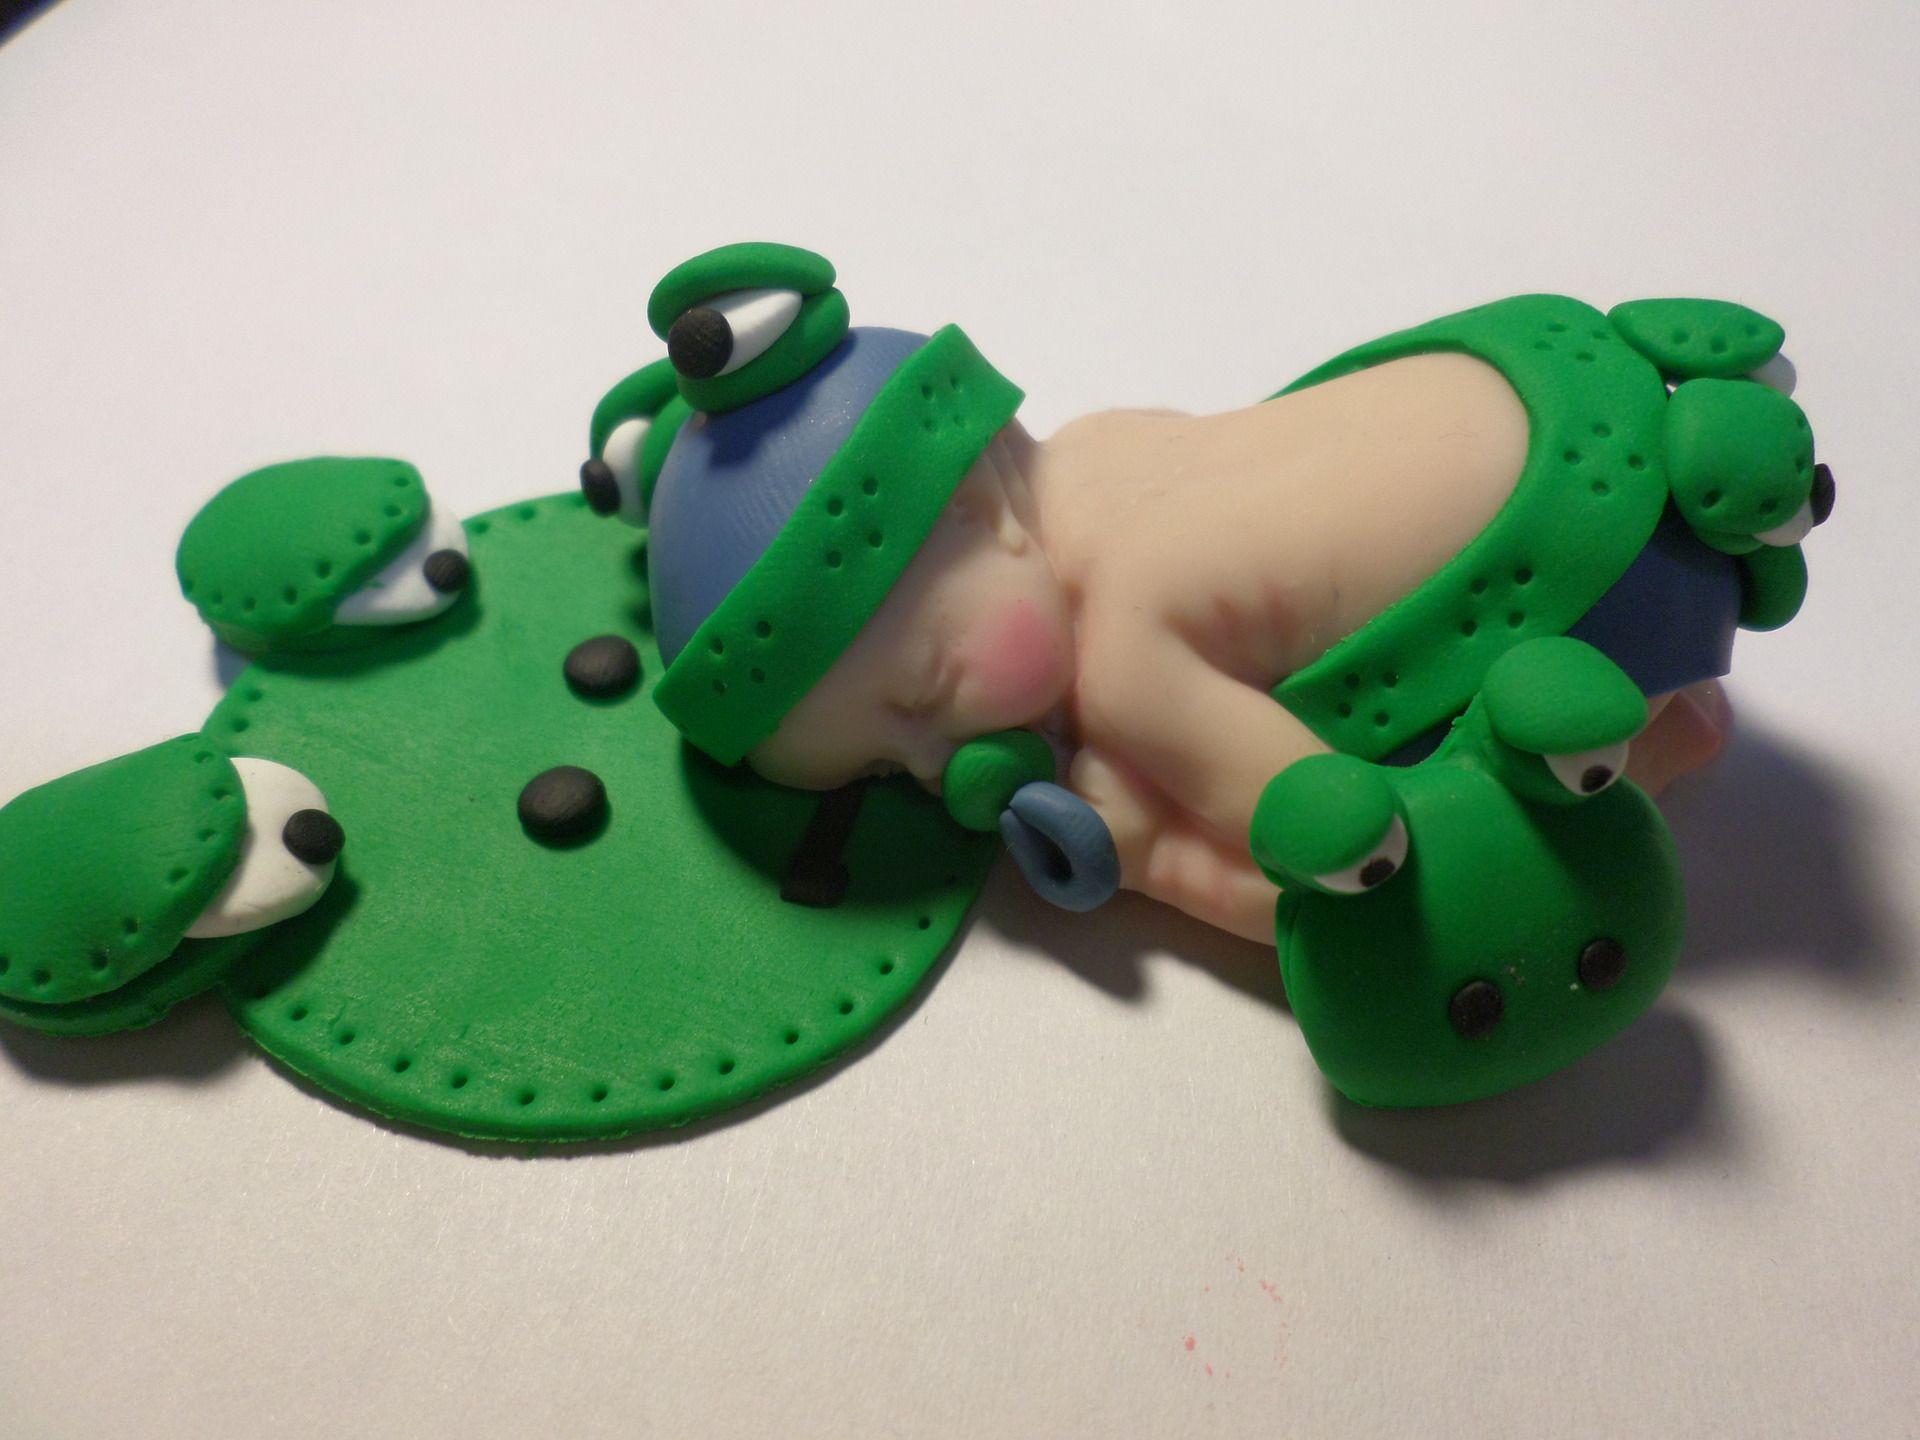 b b fimo gar on habill en grenouille acheter pinterest petits gar ons fimo et jolies. Black Bedroom Furniture Sets. Home Design Ideas